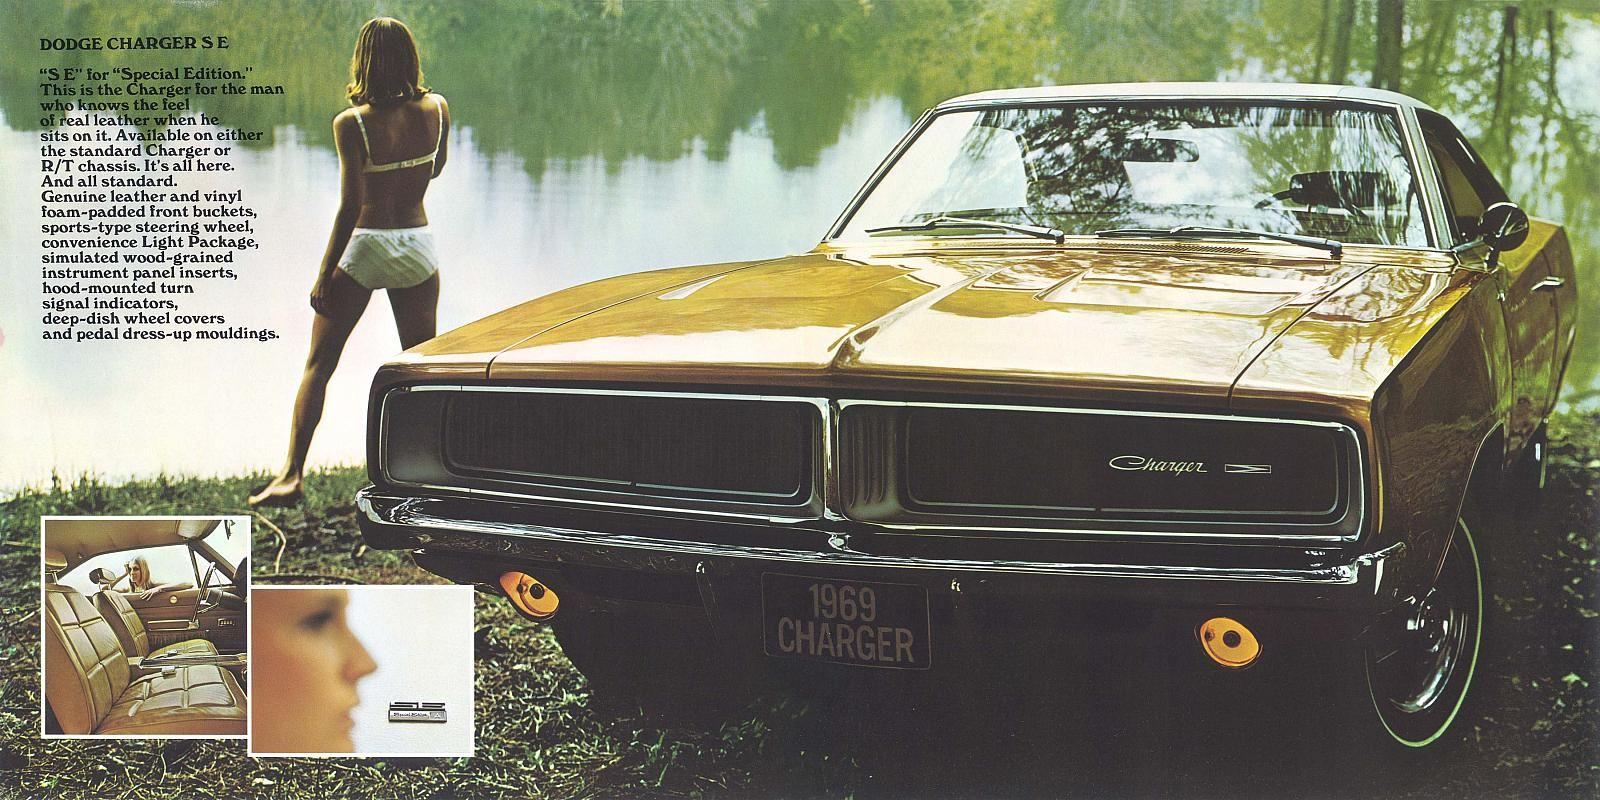 1969 Dodge Charger 426 Hemi